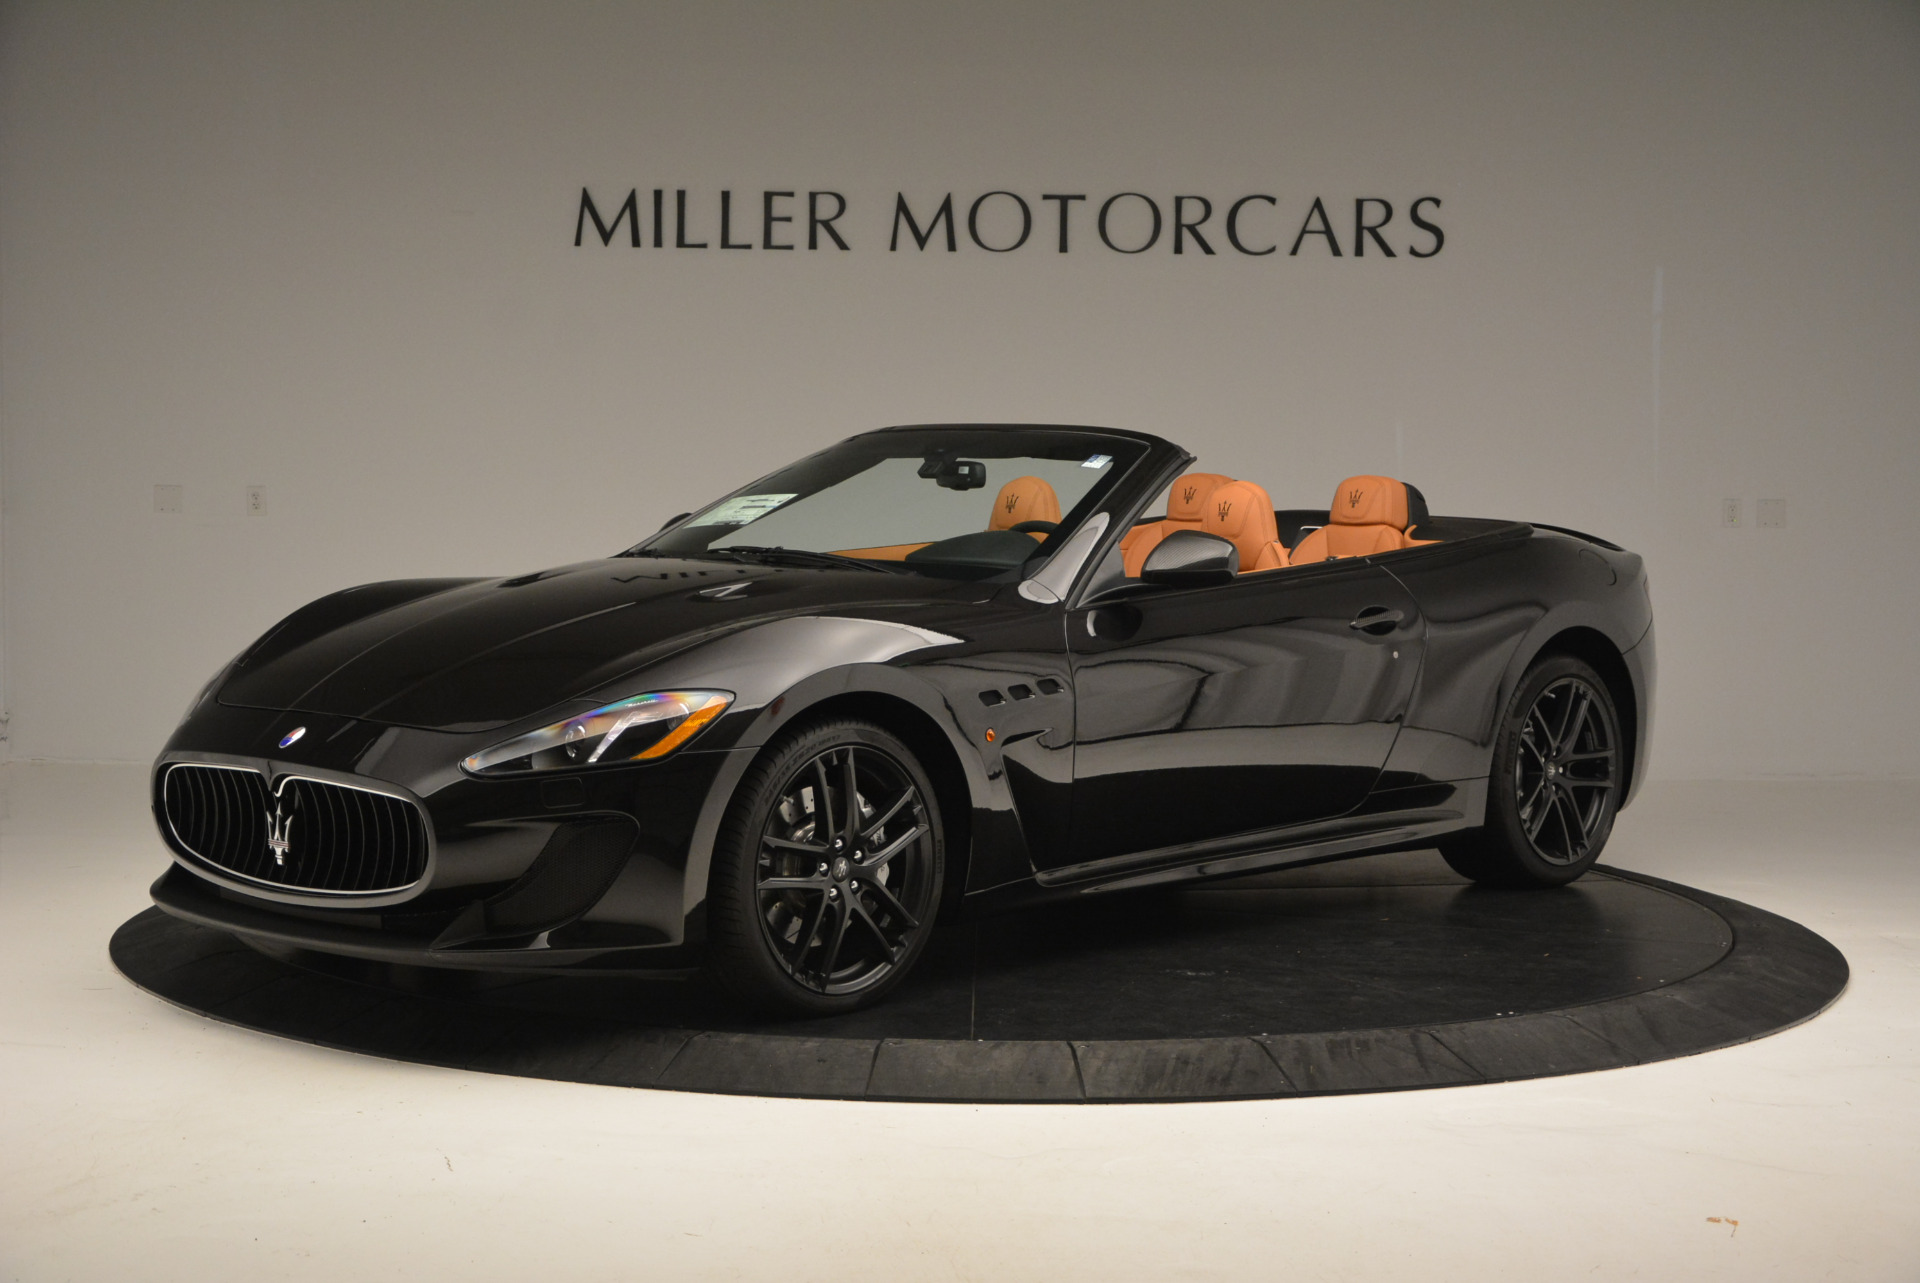 New 2017 Maserati GranTurismo MC CONVERTIBLE For Sale In Westport, CT 596_p2